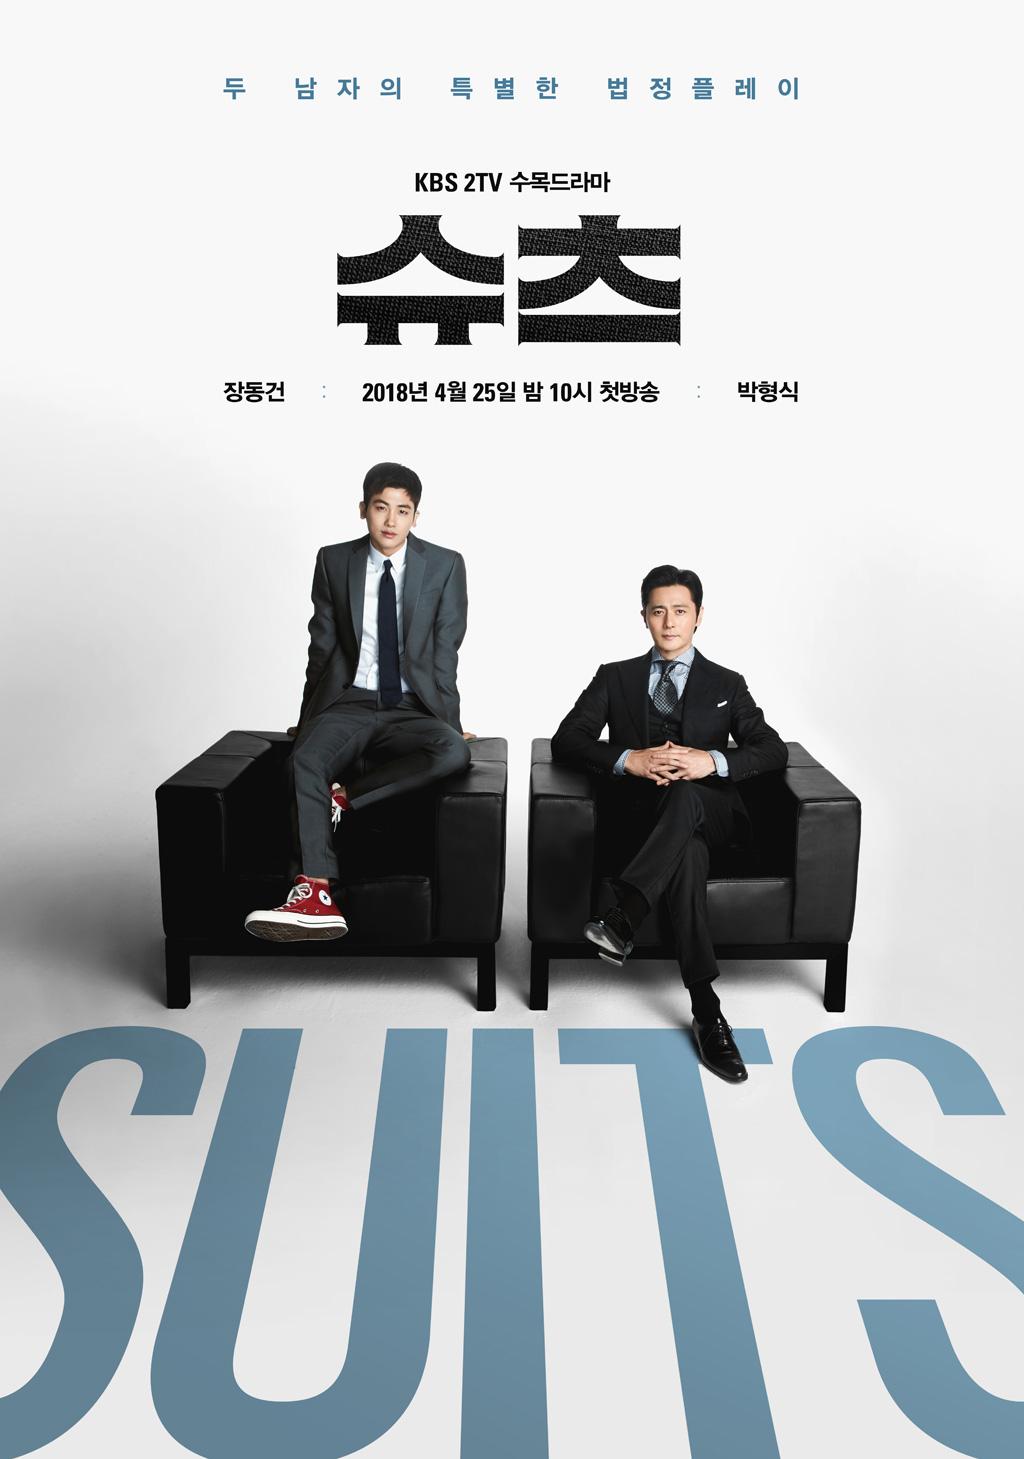 KBS水木劇《金裝律師》 朴炯植跟張東健